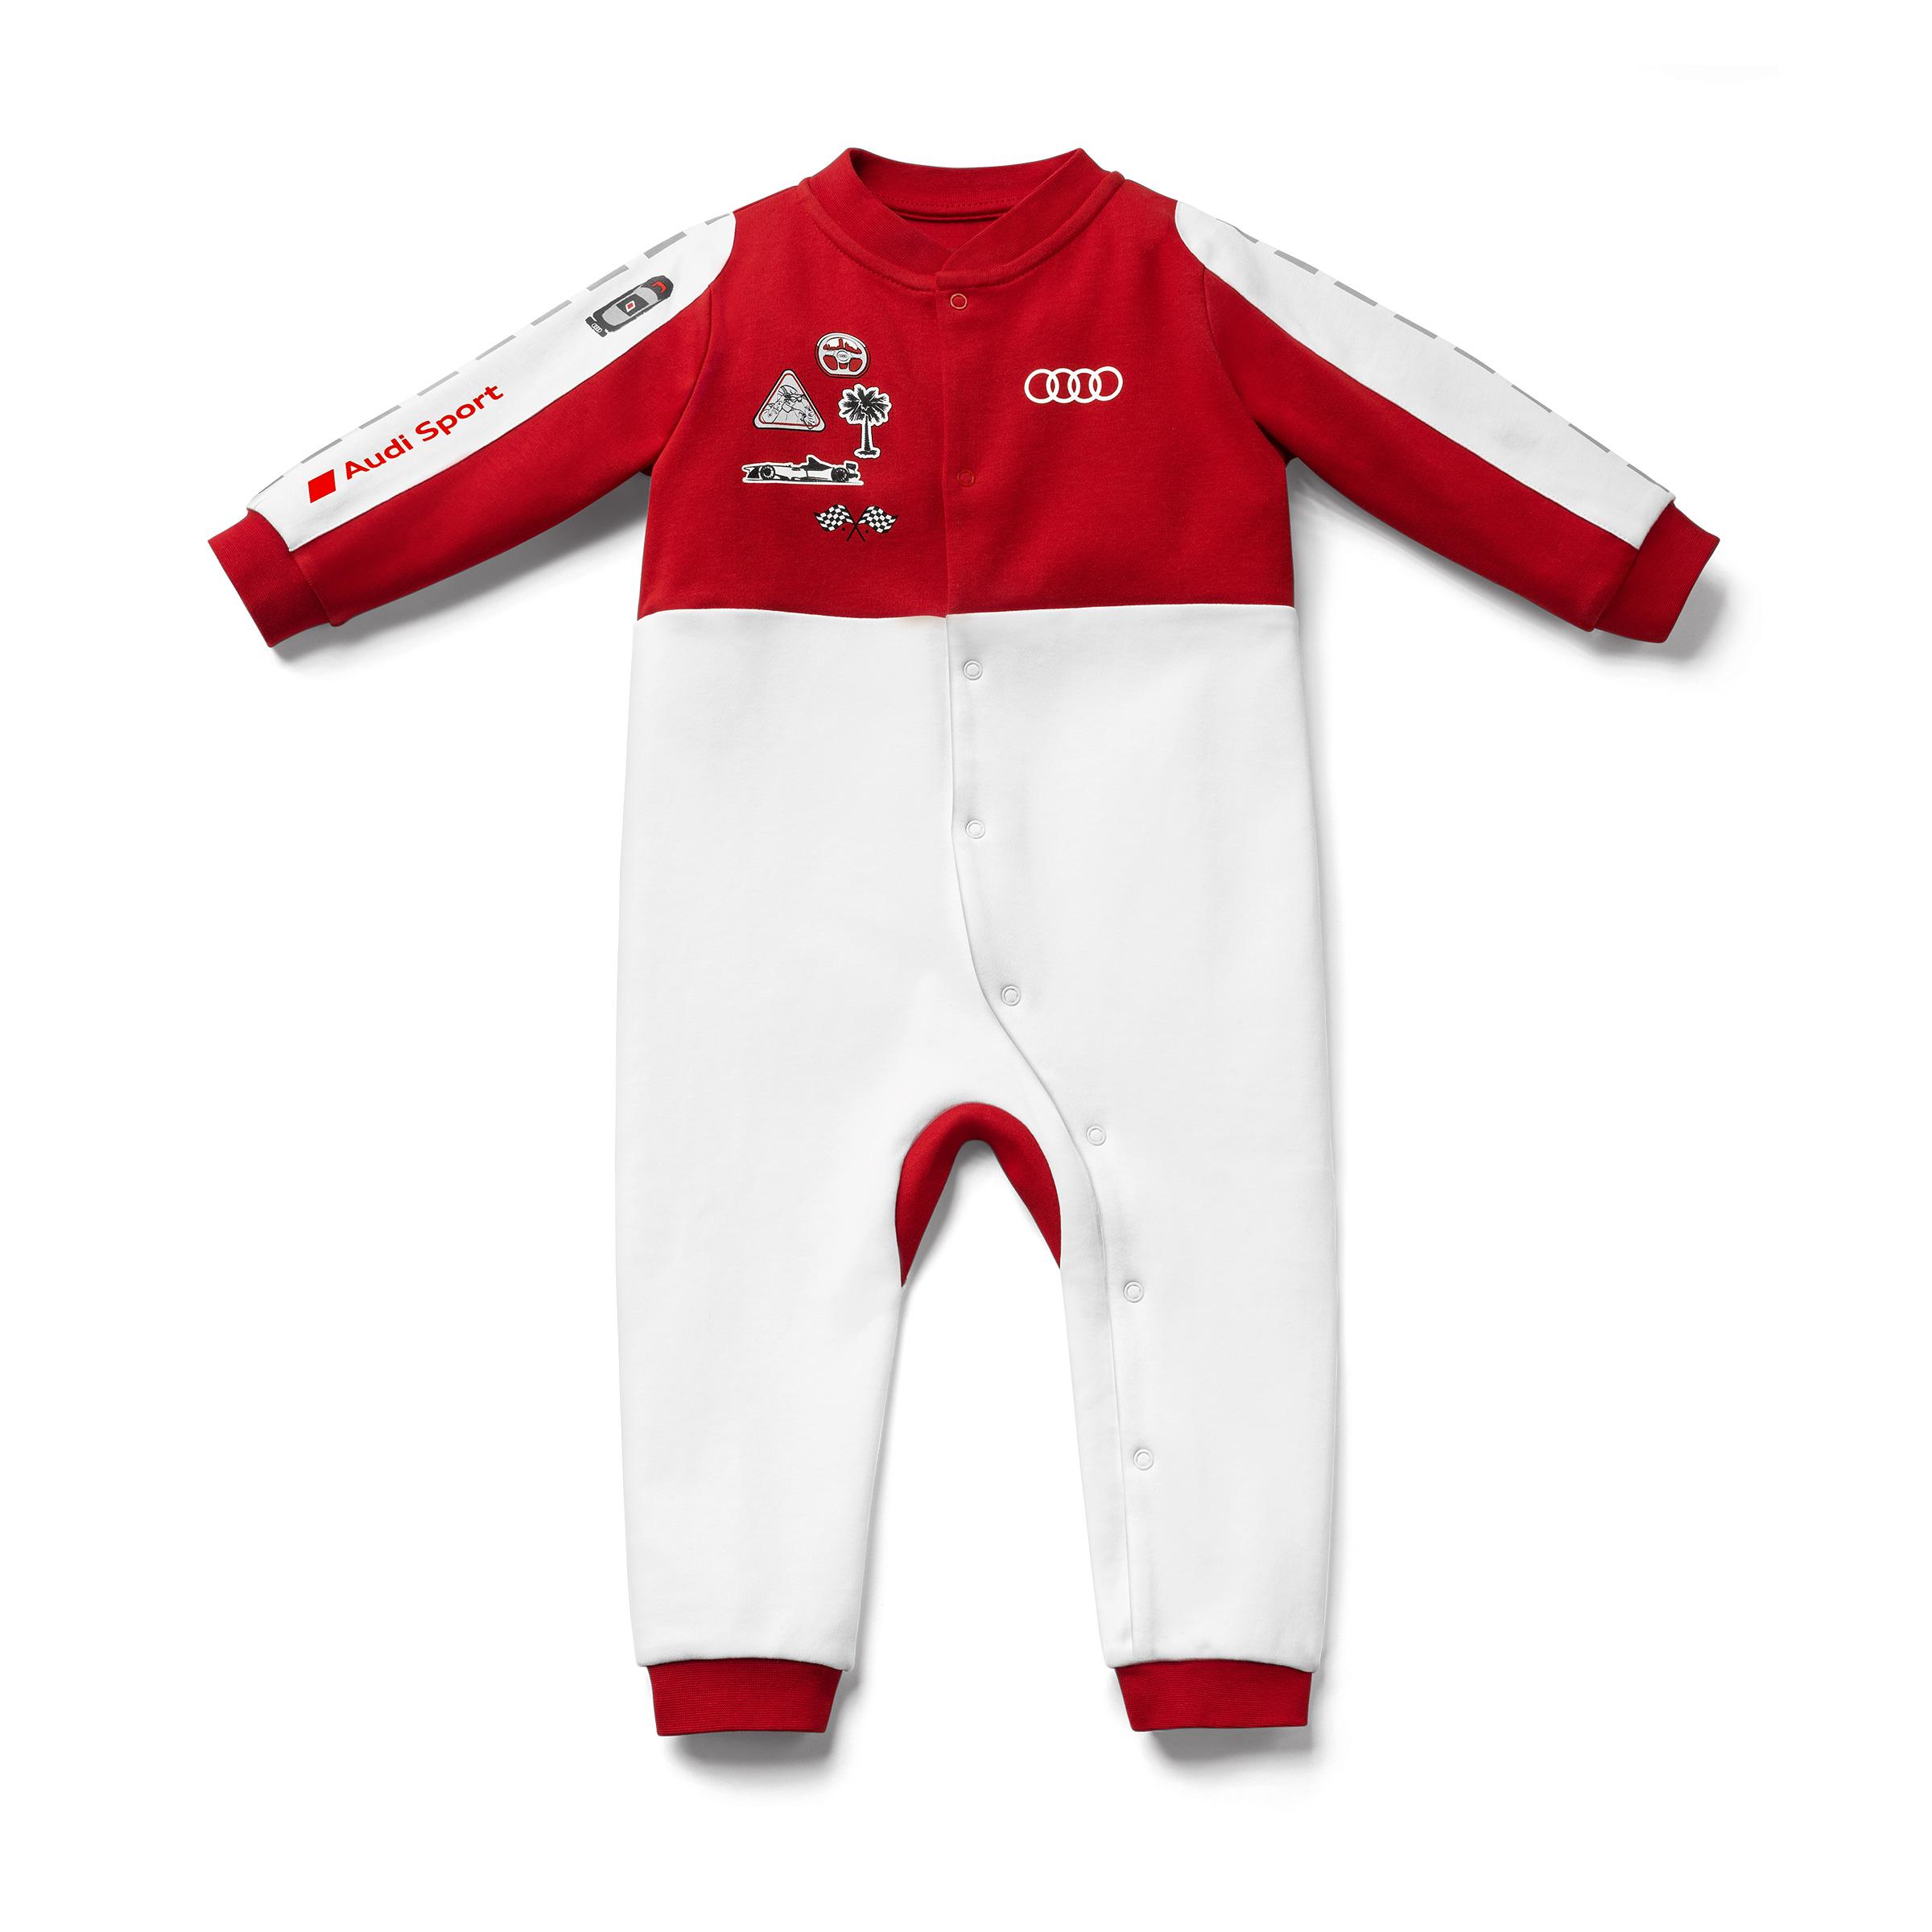 Audi Sport Baby Strampler Racing Größe 62/68 weiß/rot Baumwolle